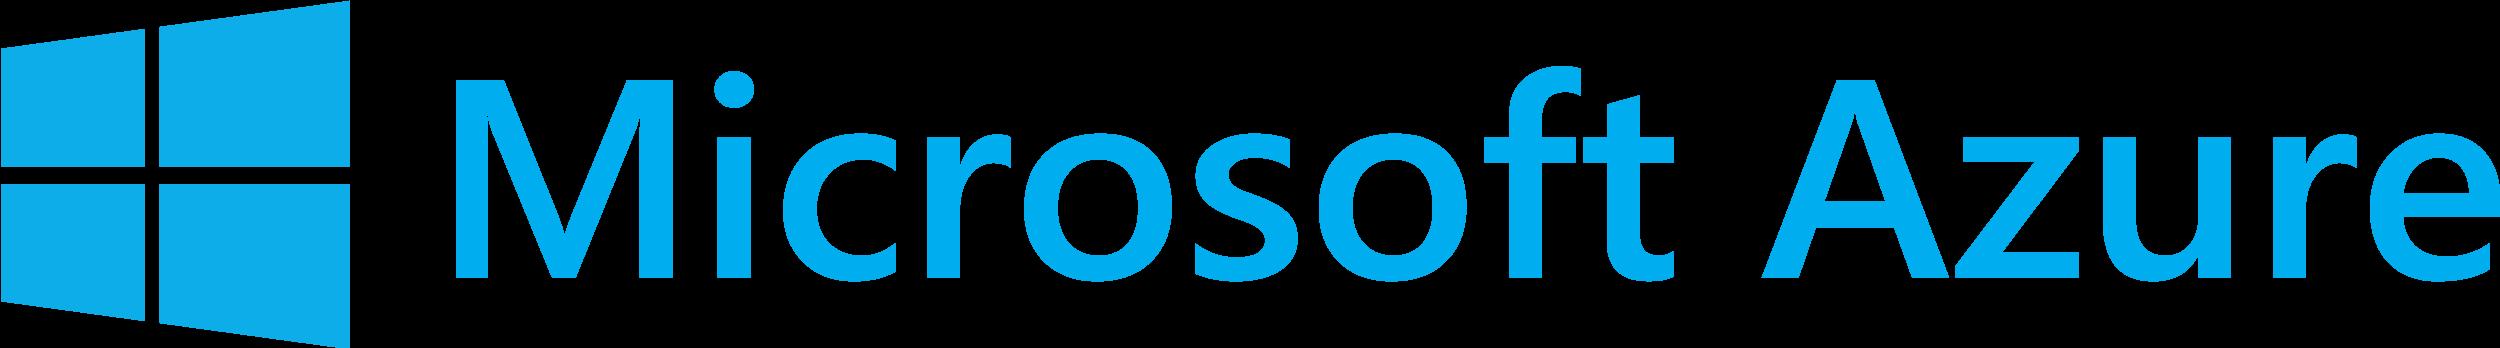 SmartHOTEL Microsoft Azure Cloud Hosting Solutions